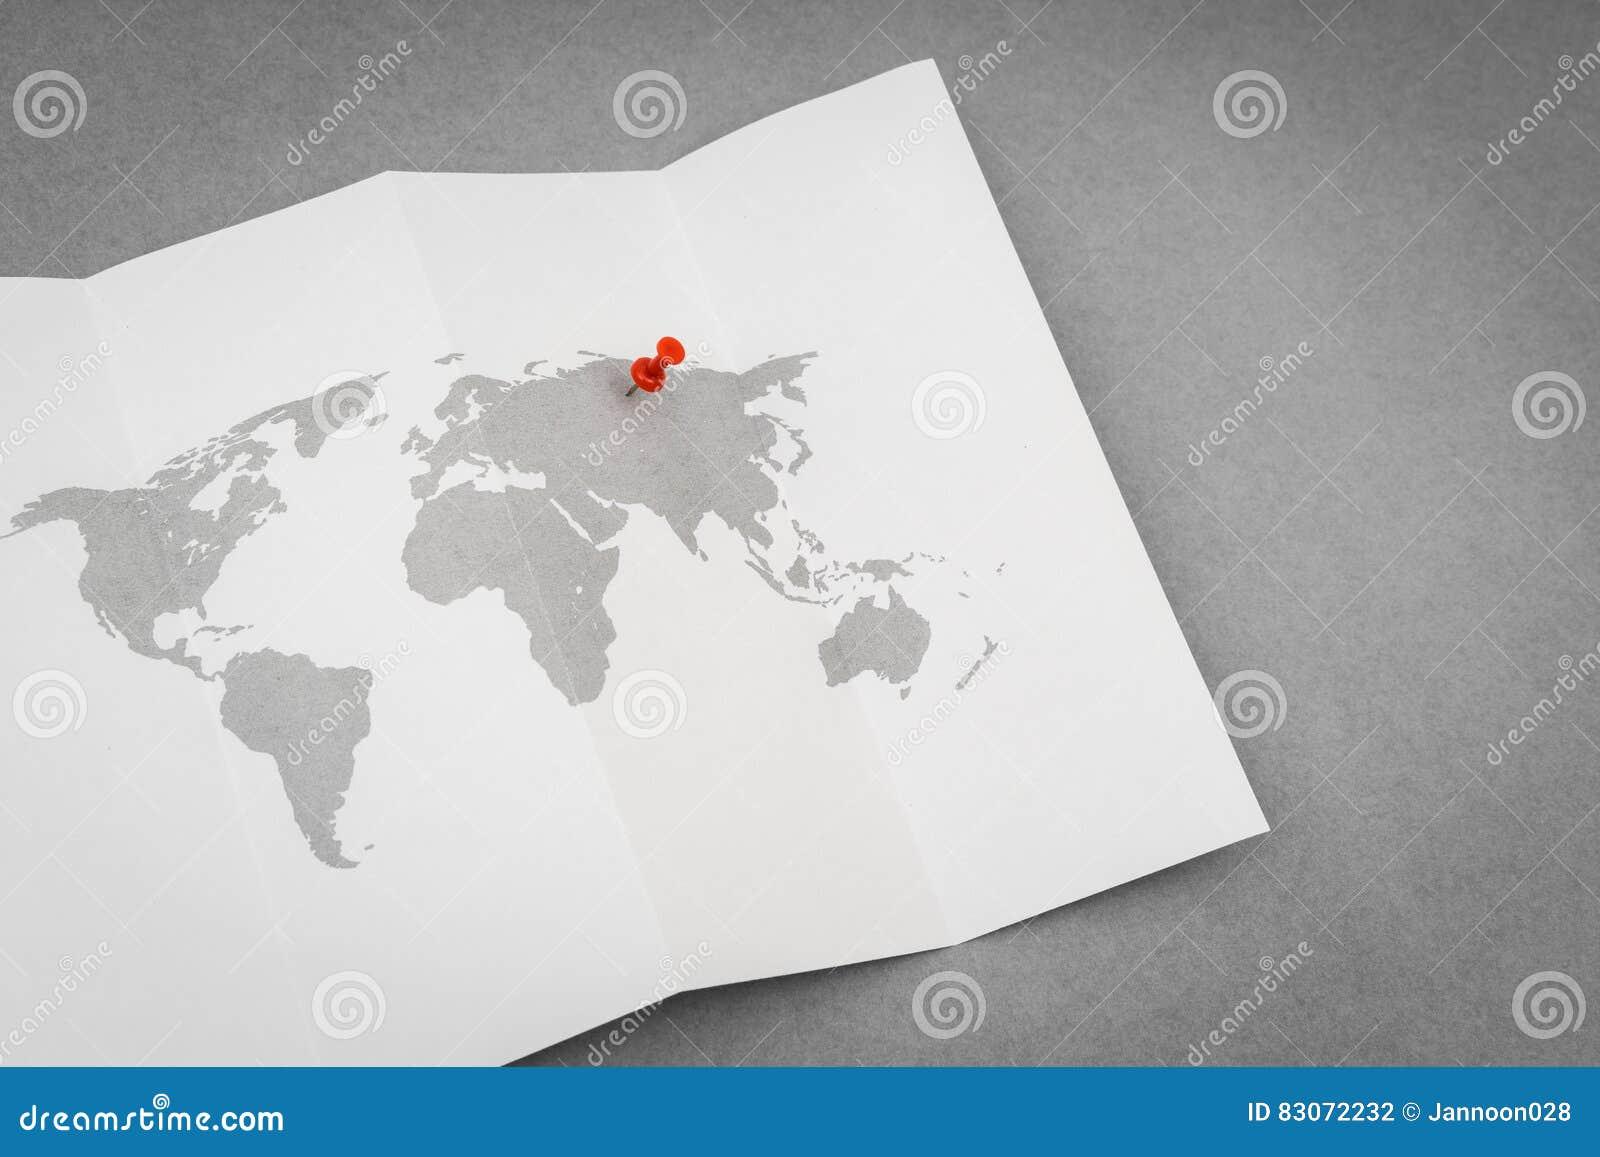 Mapa del mundo doblado papel con pin pointer rojo foto de - Papel pintado mapa del mundo ...